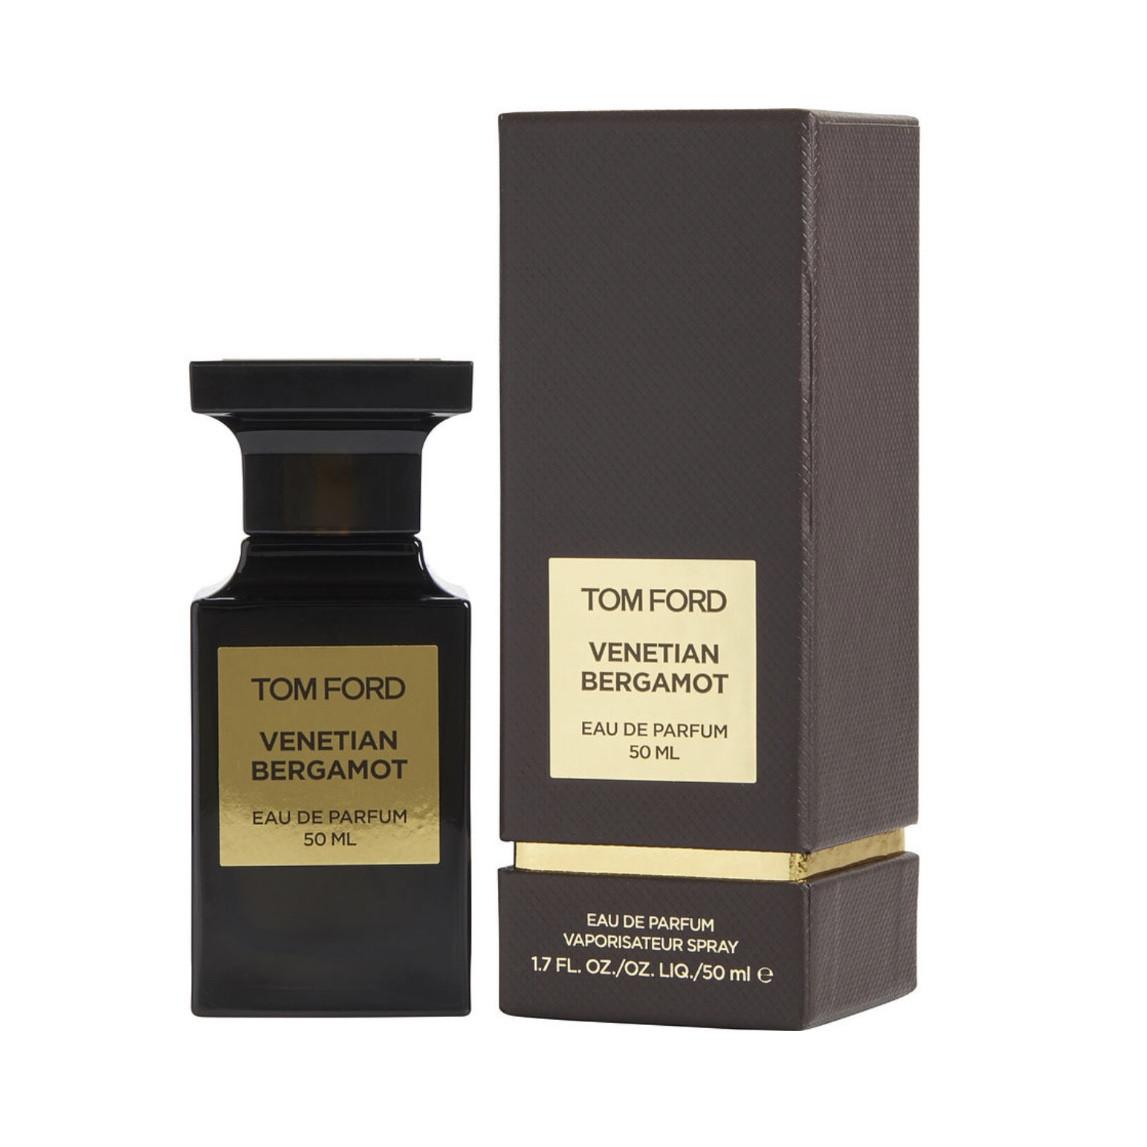 TOM FORD Venetian Bergamot (Том Форд Венецианский Бергамот) парфюмированная вода - 50ml